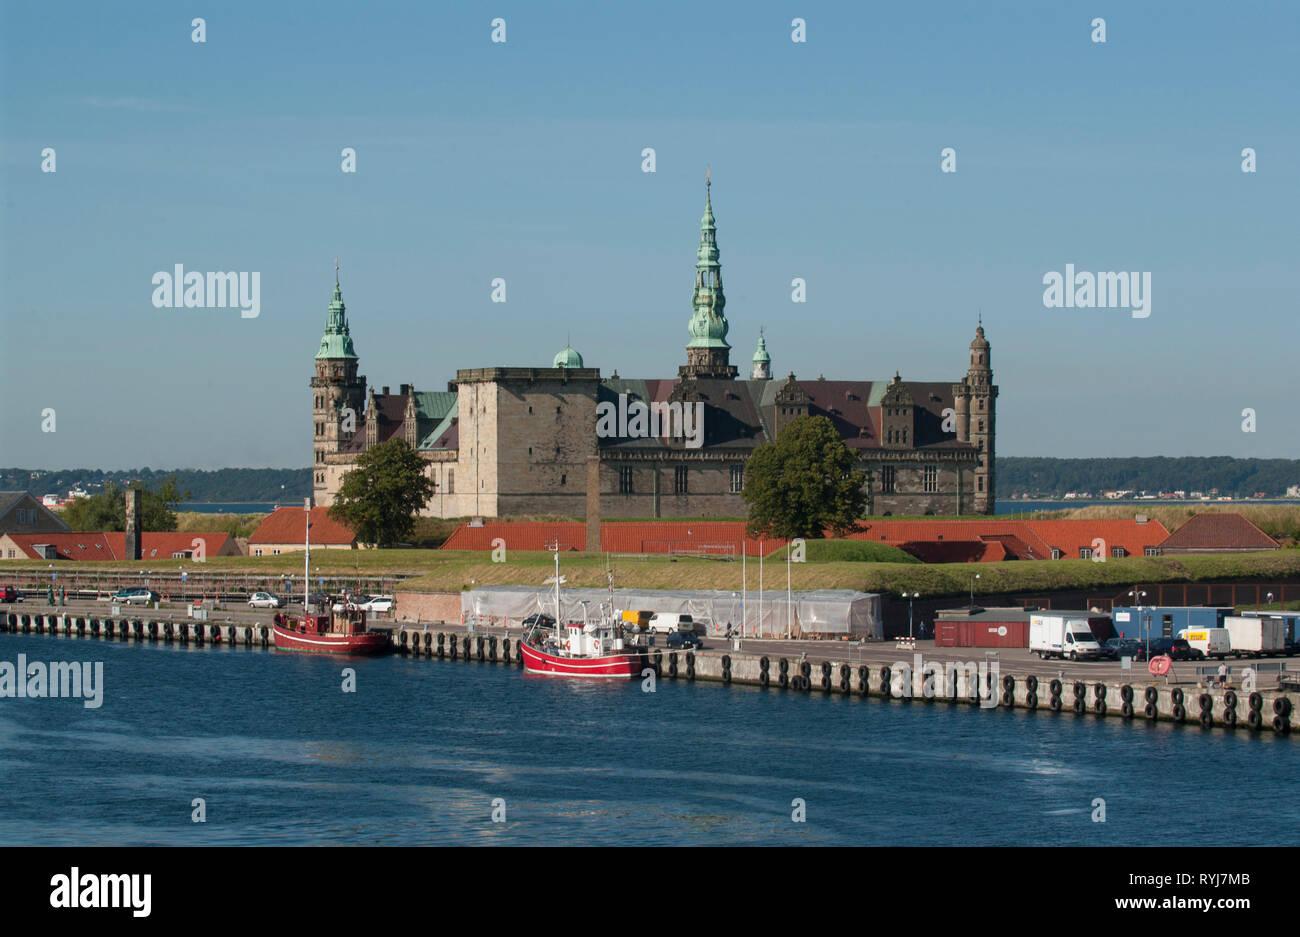 The castle Kronborg at Sjælland, Öresund, Denmark. - Stock Image